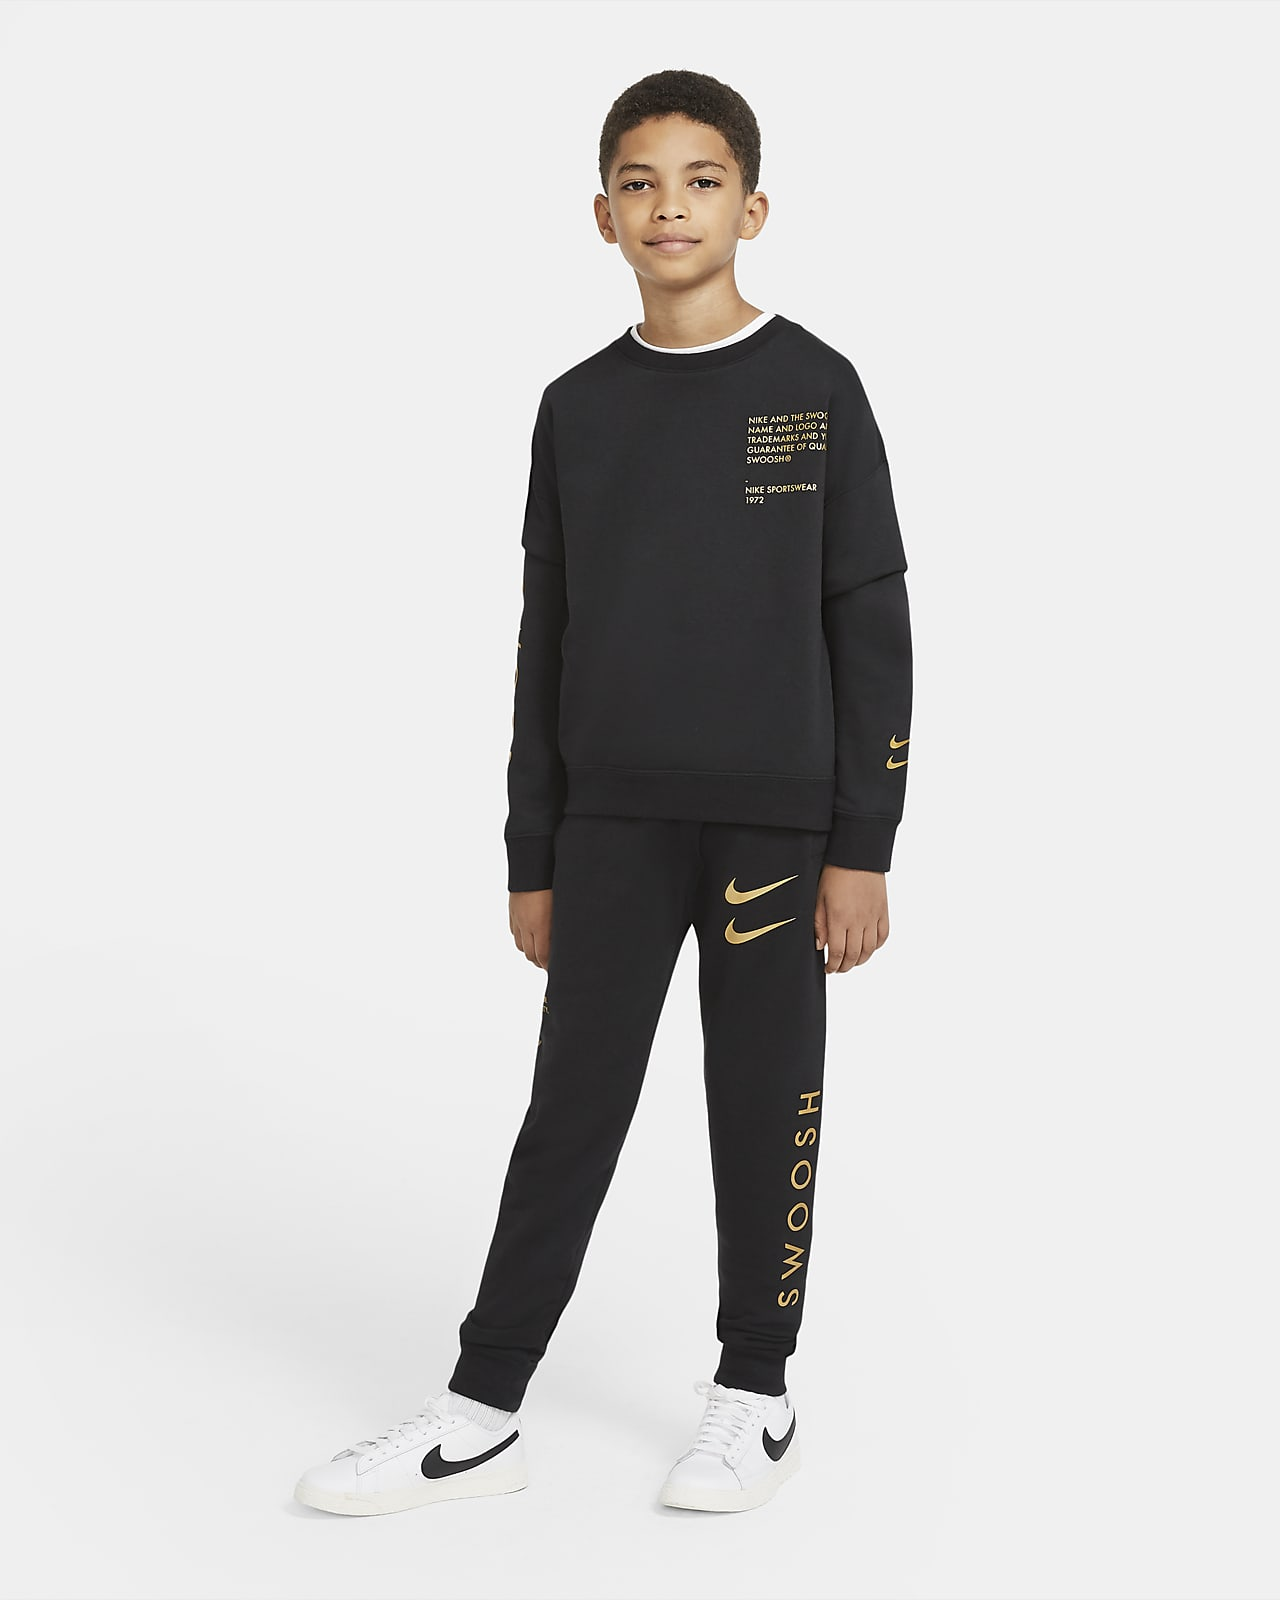 Nike Sportswear Swoosh Big Kids' (Boys